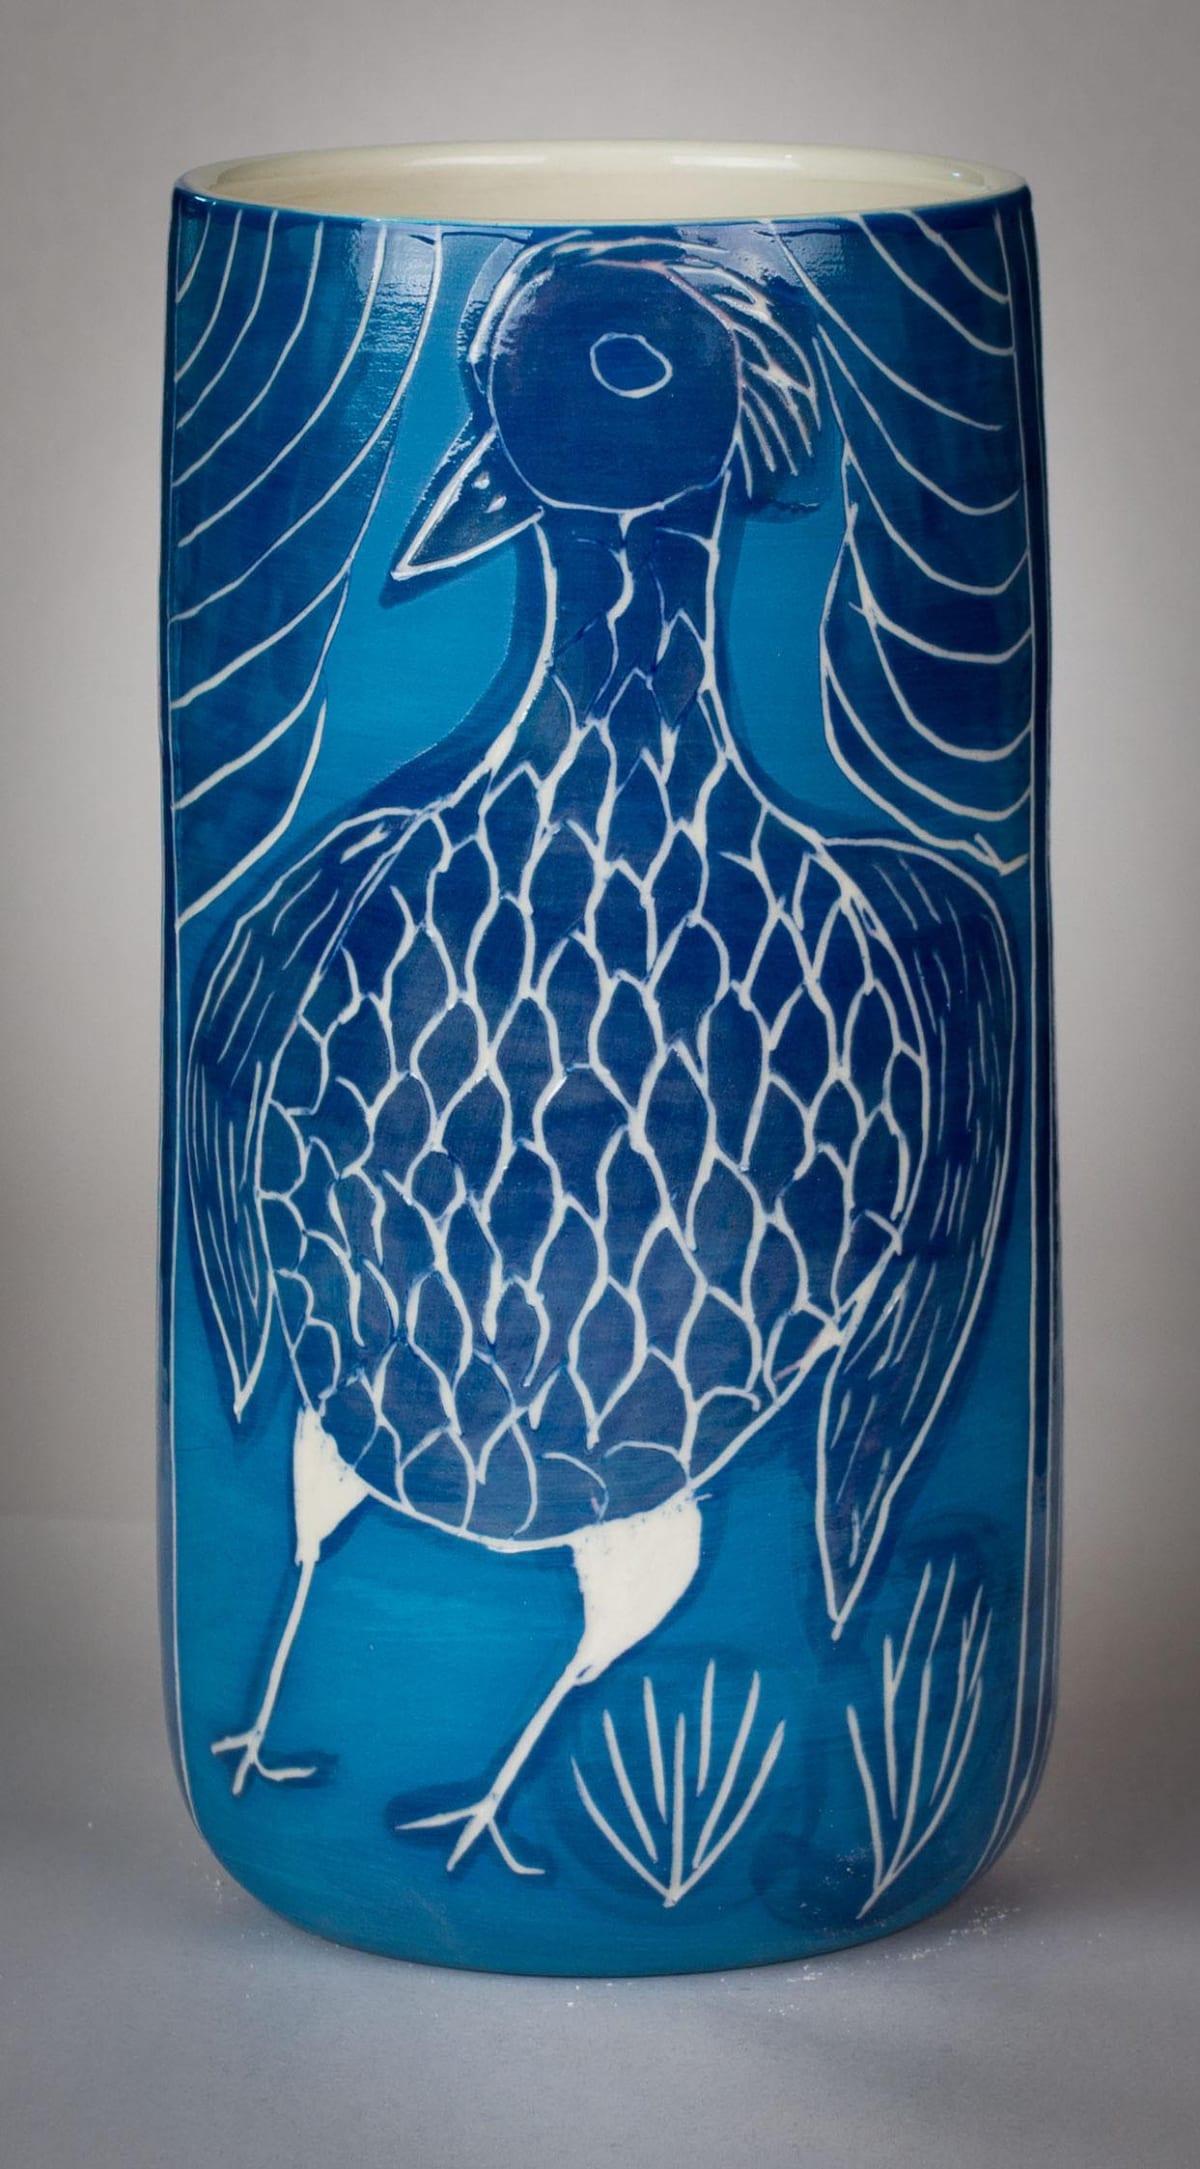 Carlene Thompson Tjulpu Stoneware 22.5 x 11 cm